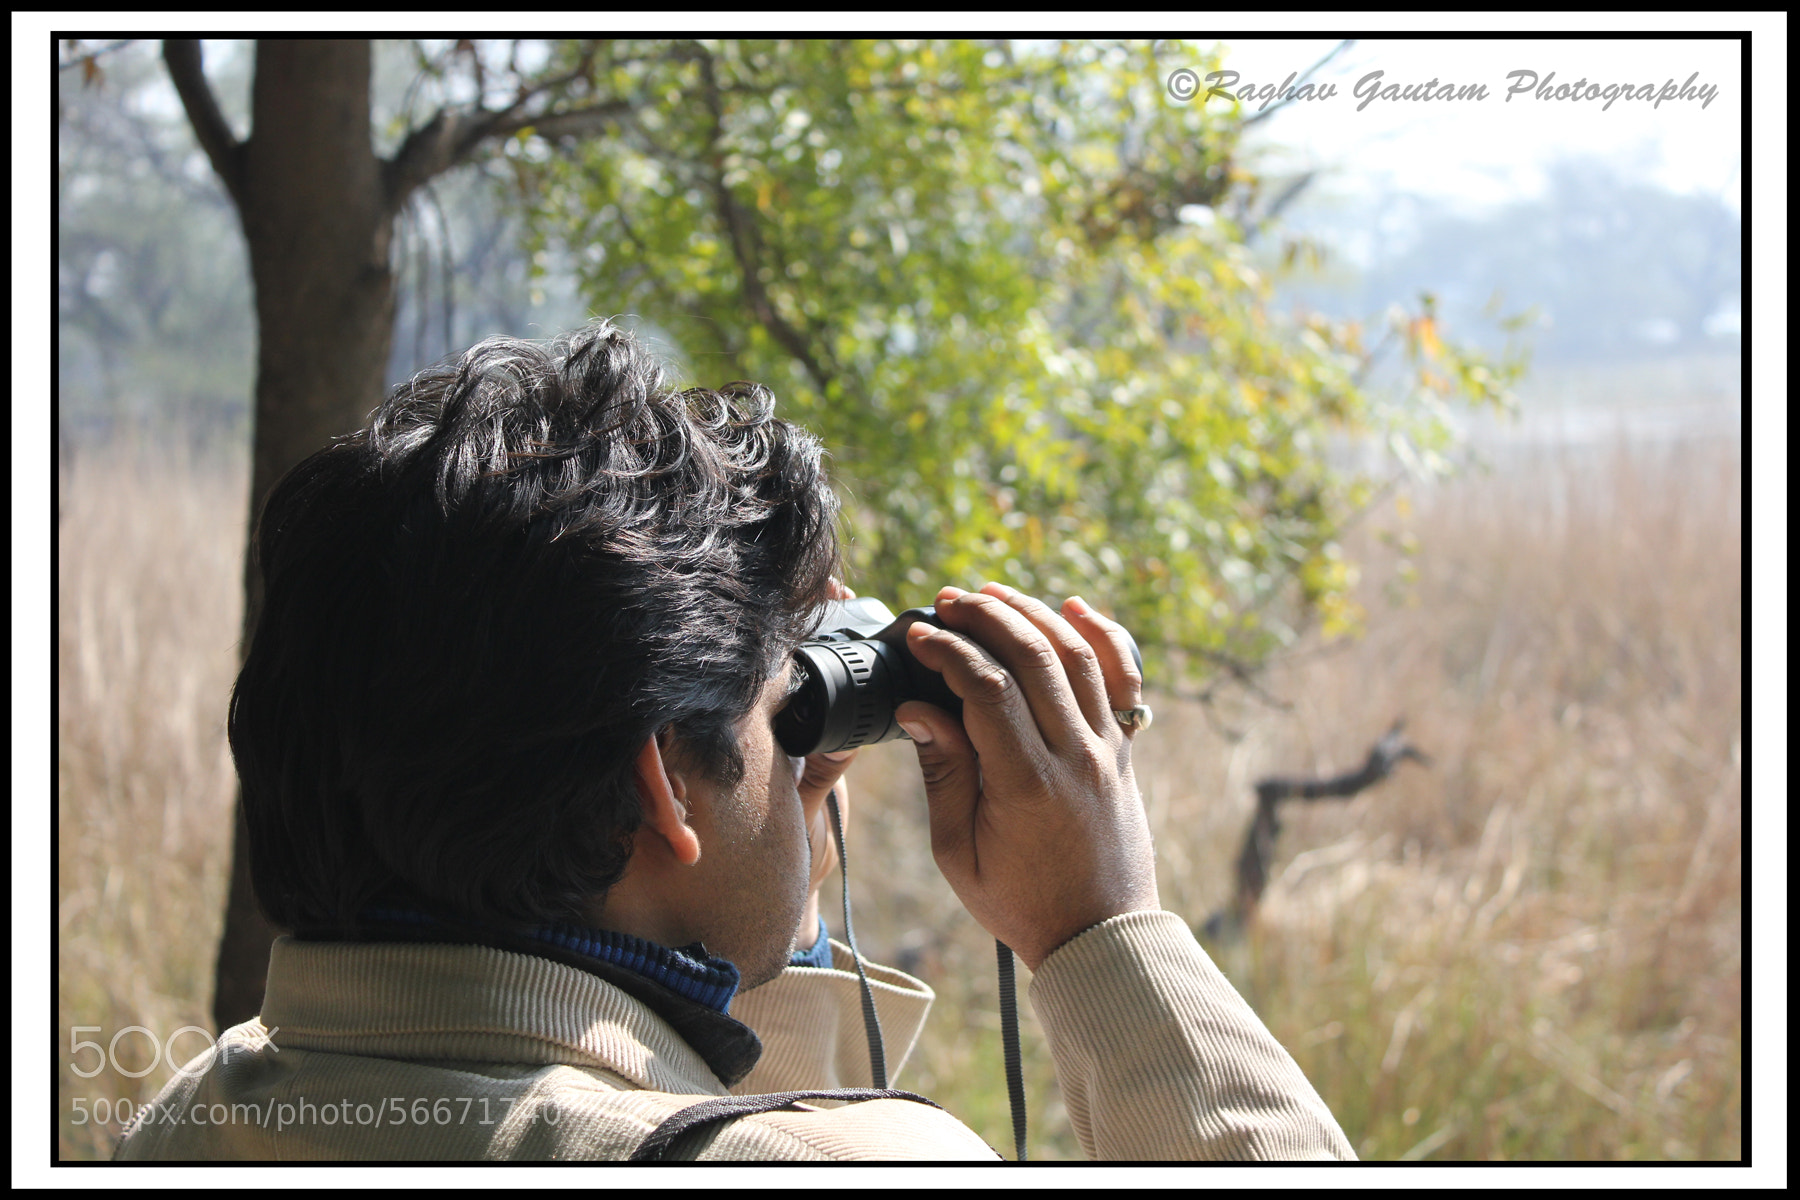 Photograph Far-sightedness by Raghav Gautam on 500px